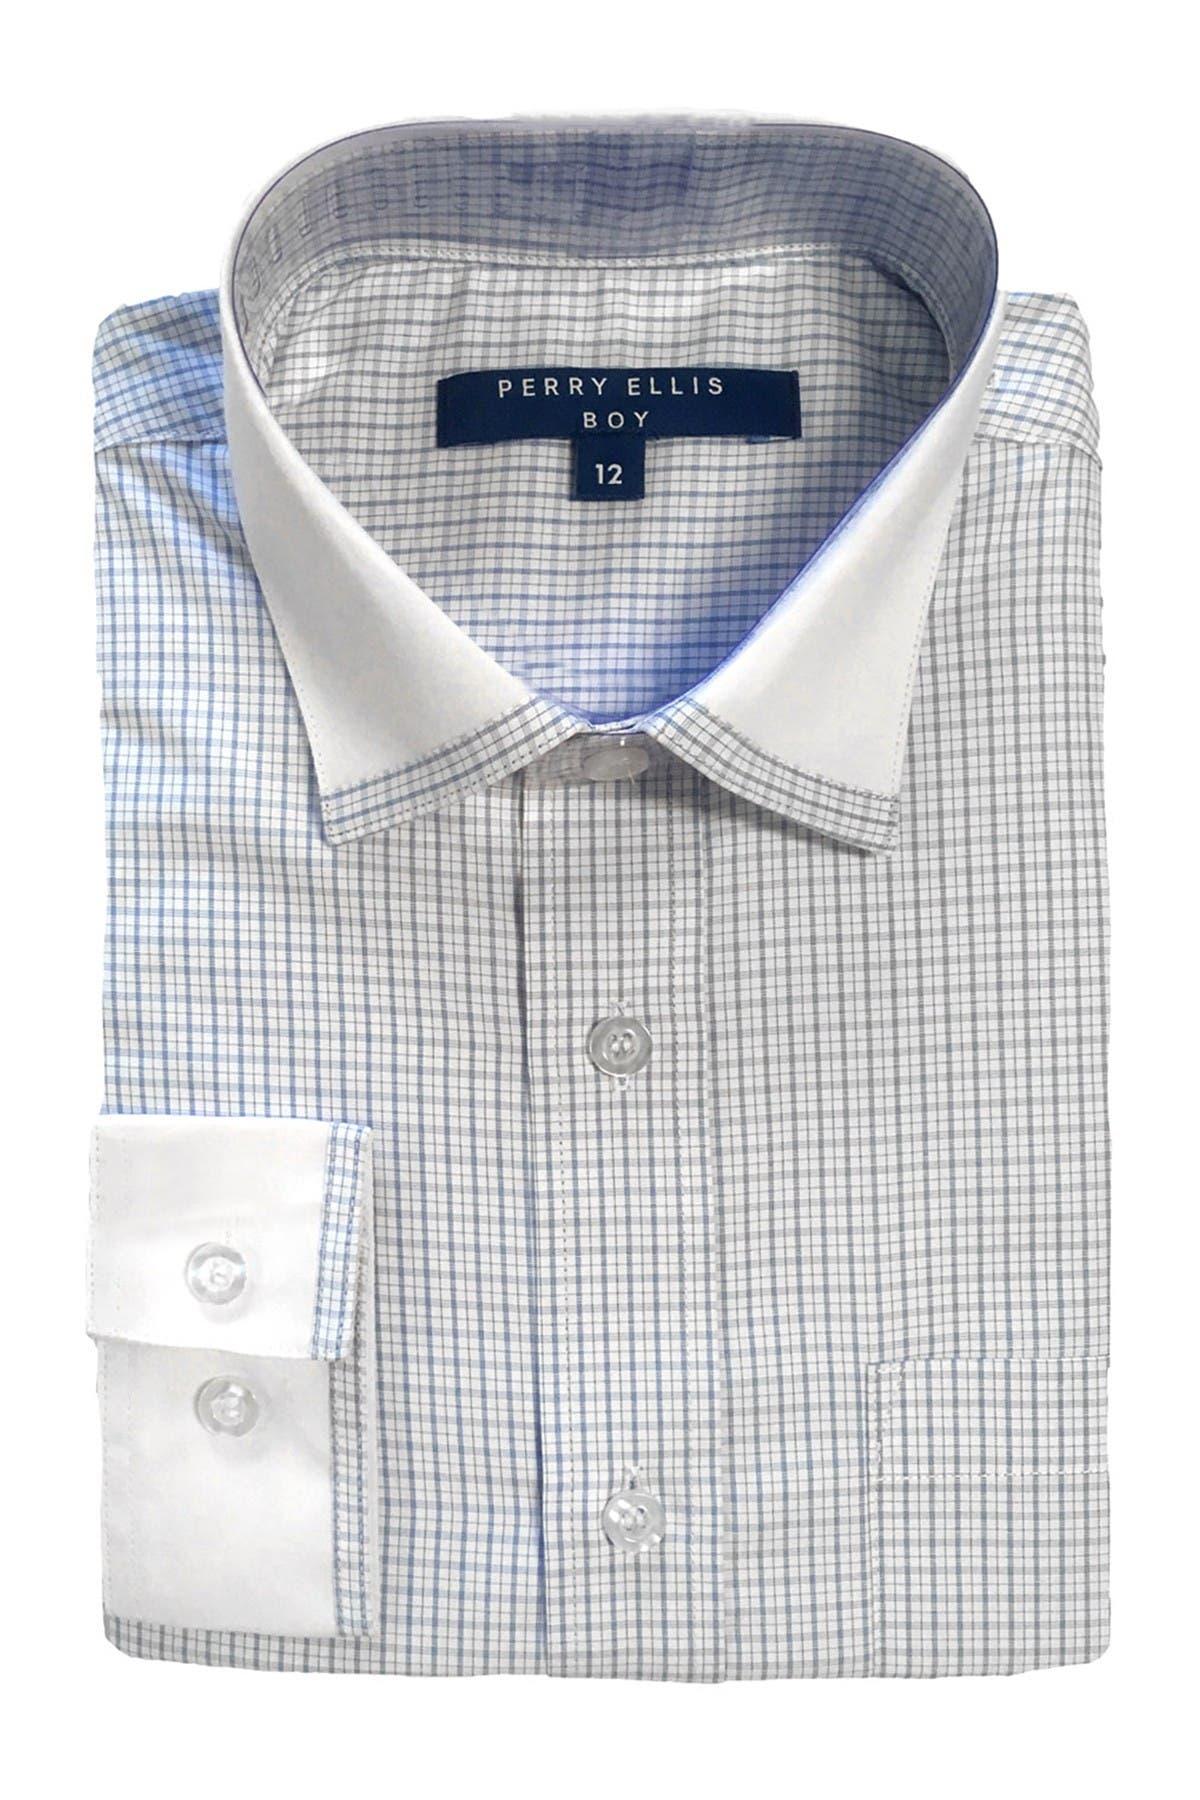 Image of Perry Ellis Contrast Collar Grid Print Dress Shirt